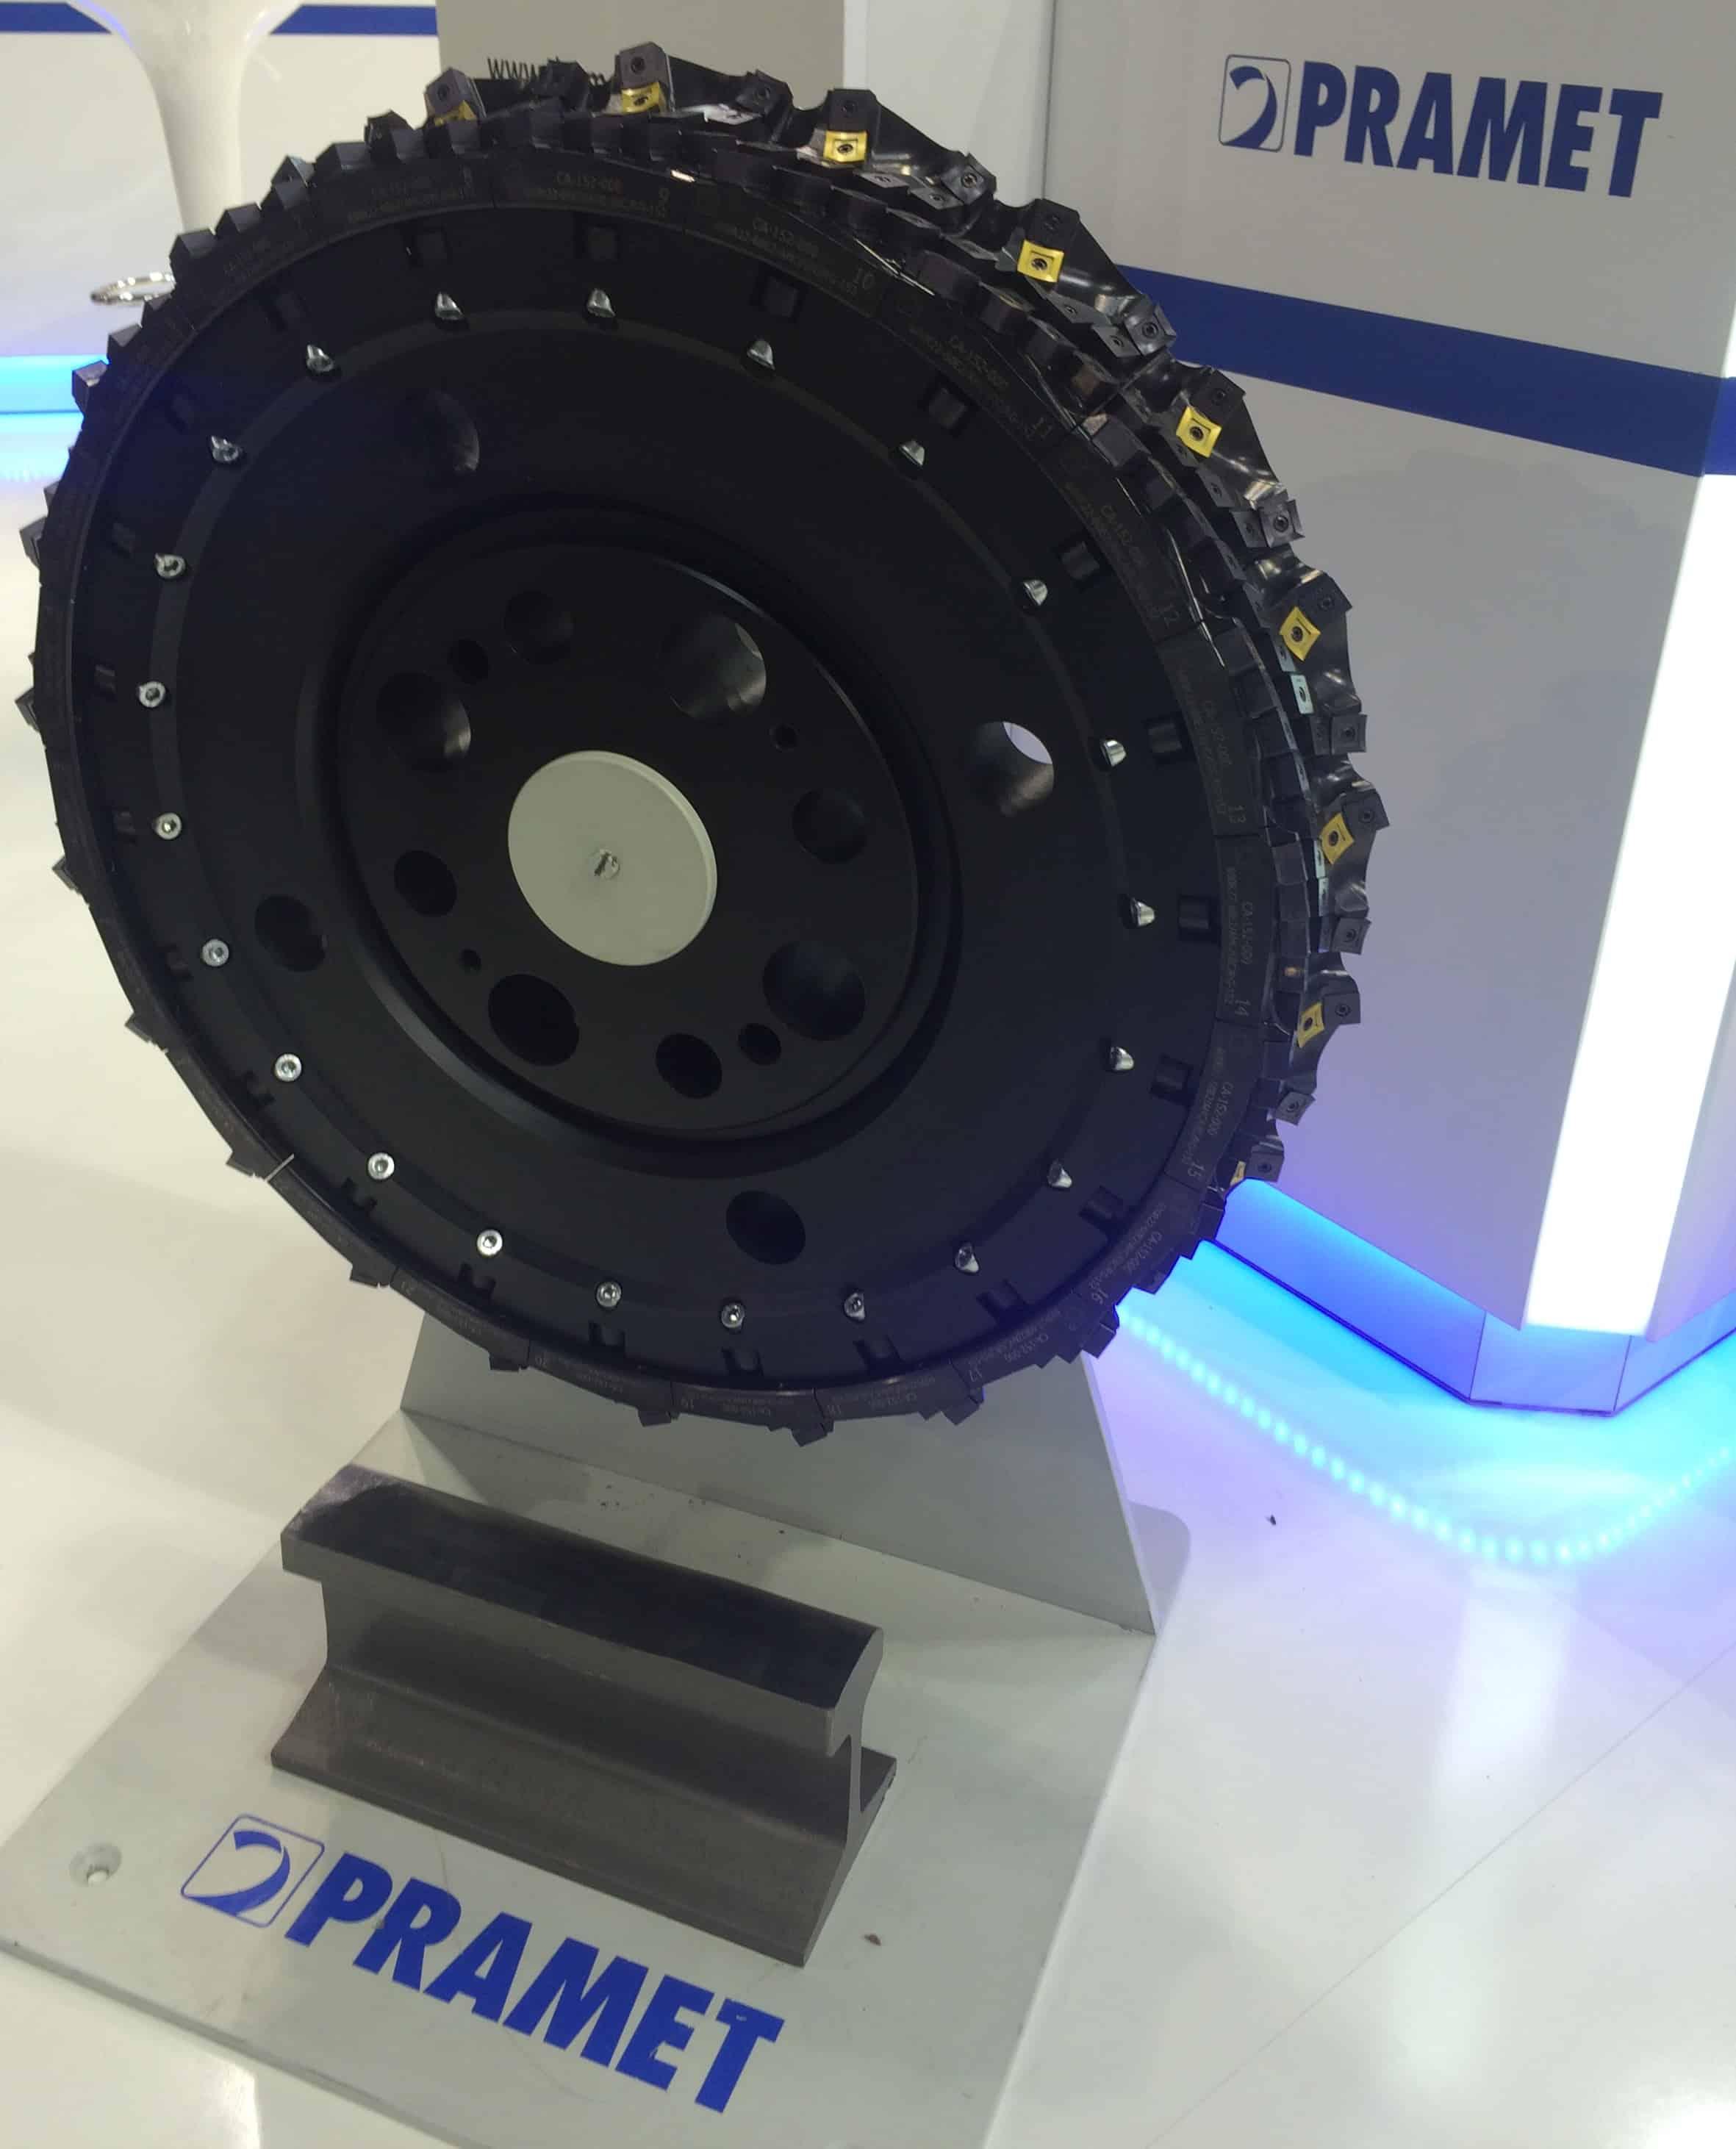 The Pramet dynamic rail milling cutter